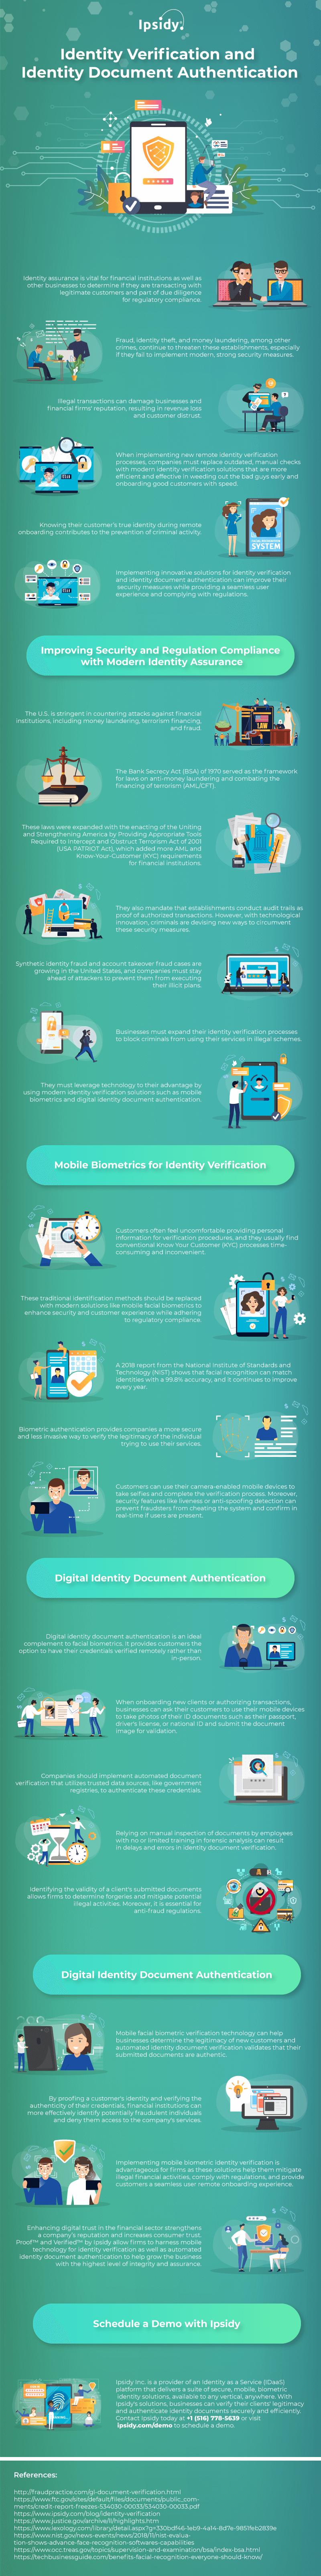 Identity Verification and Identity Document Authentication